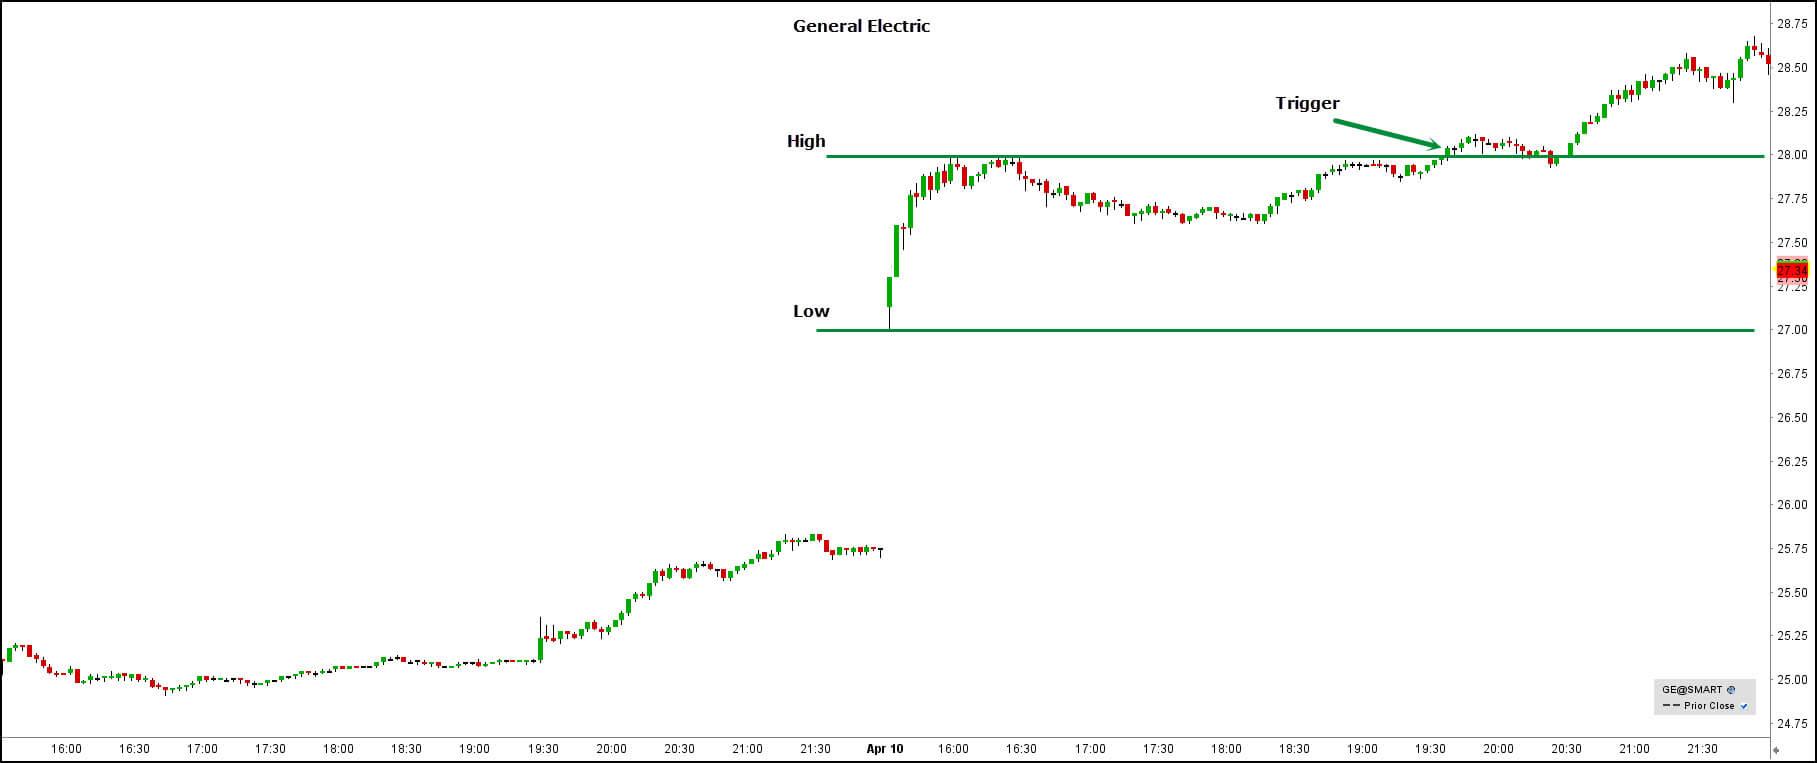 Intraday-gap-trading-bij-daytrading-stap-2-General-Electric